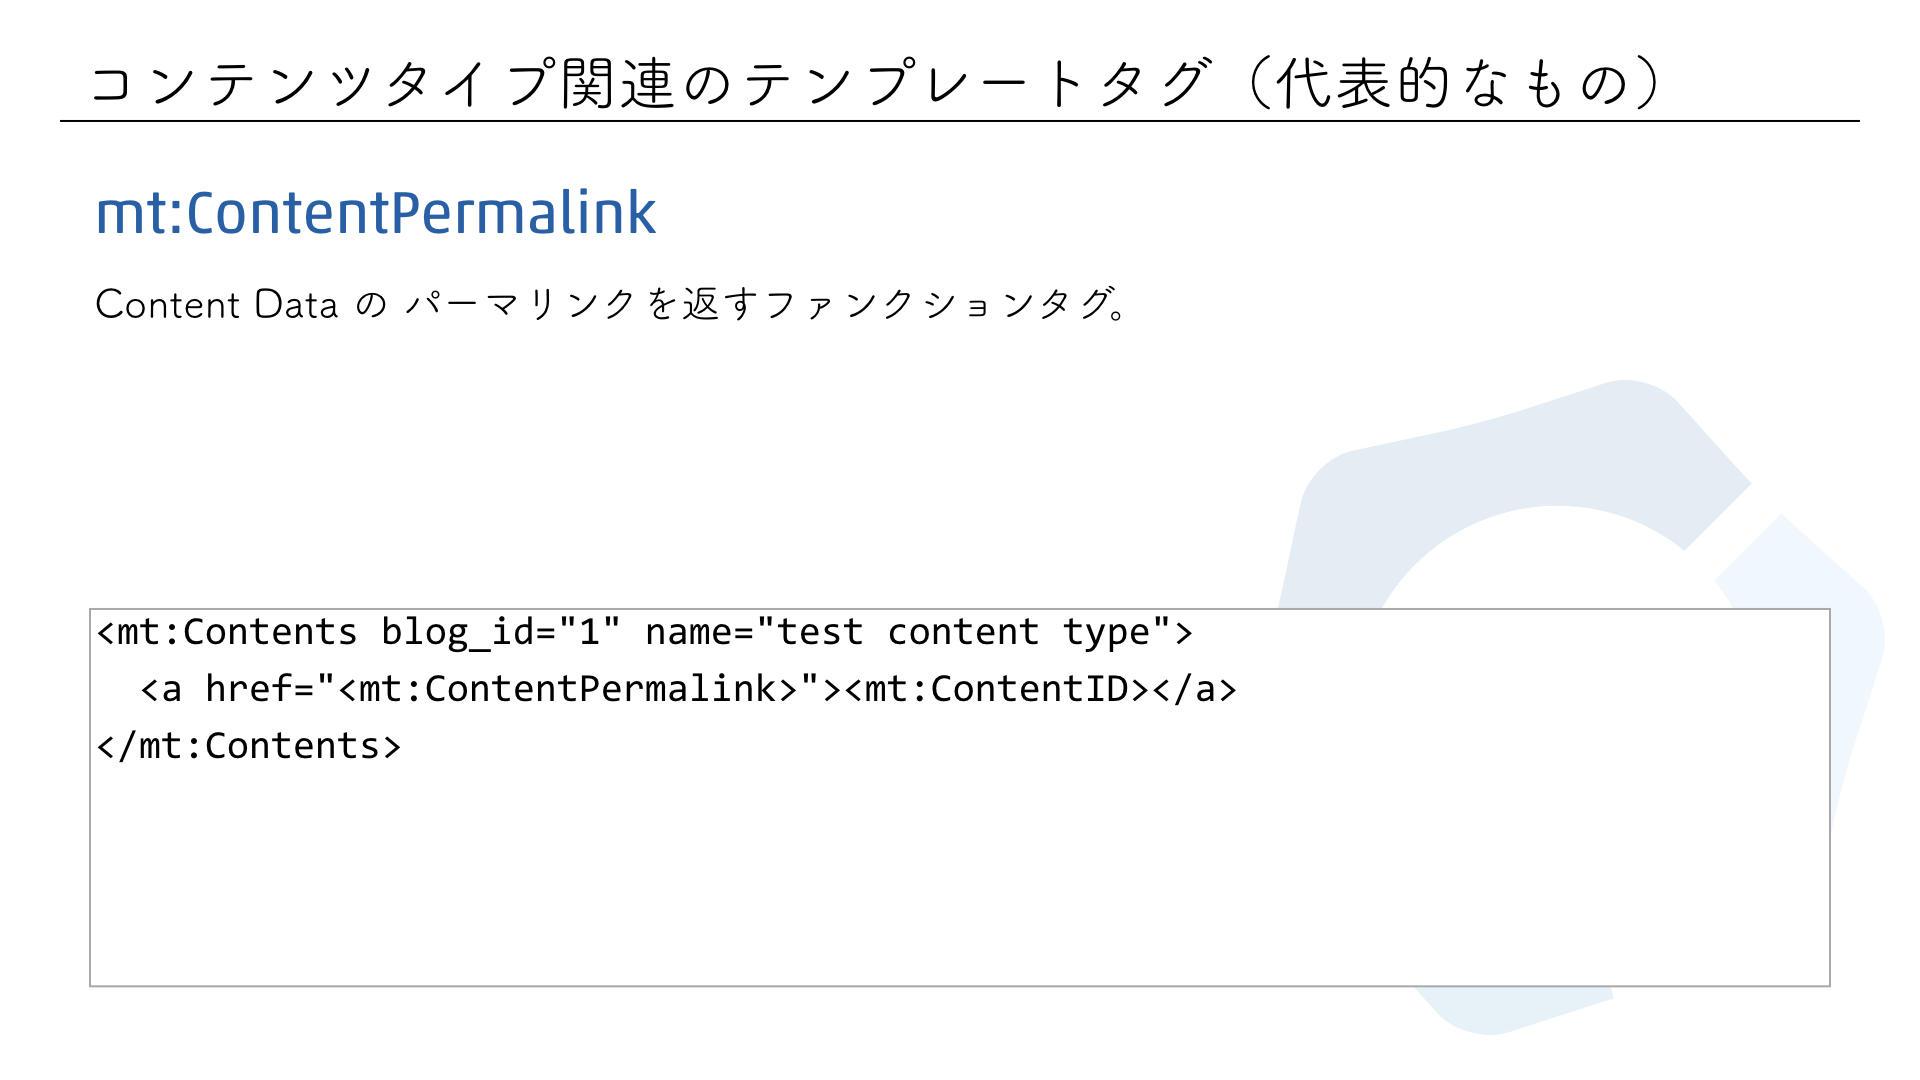 mt:ContentPermalink(スライド)